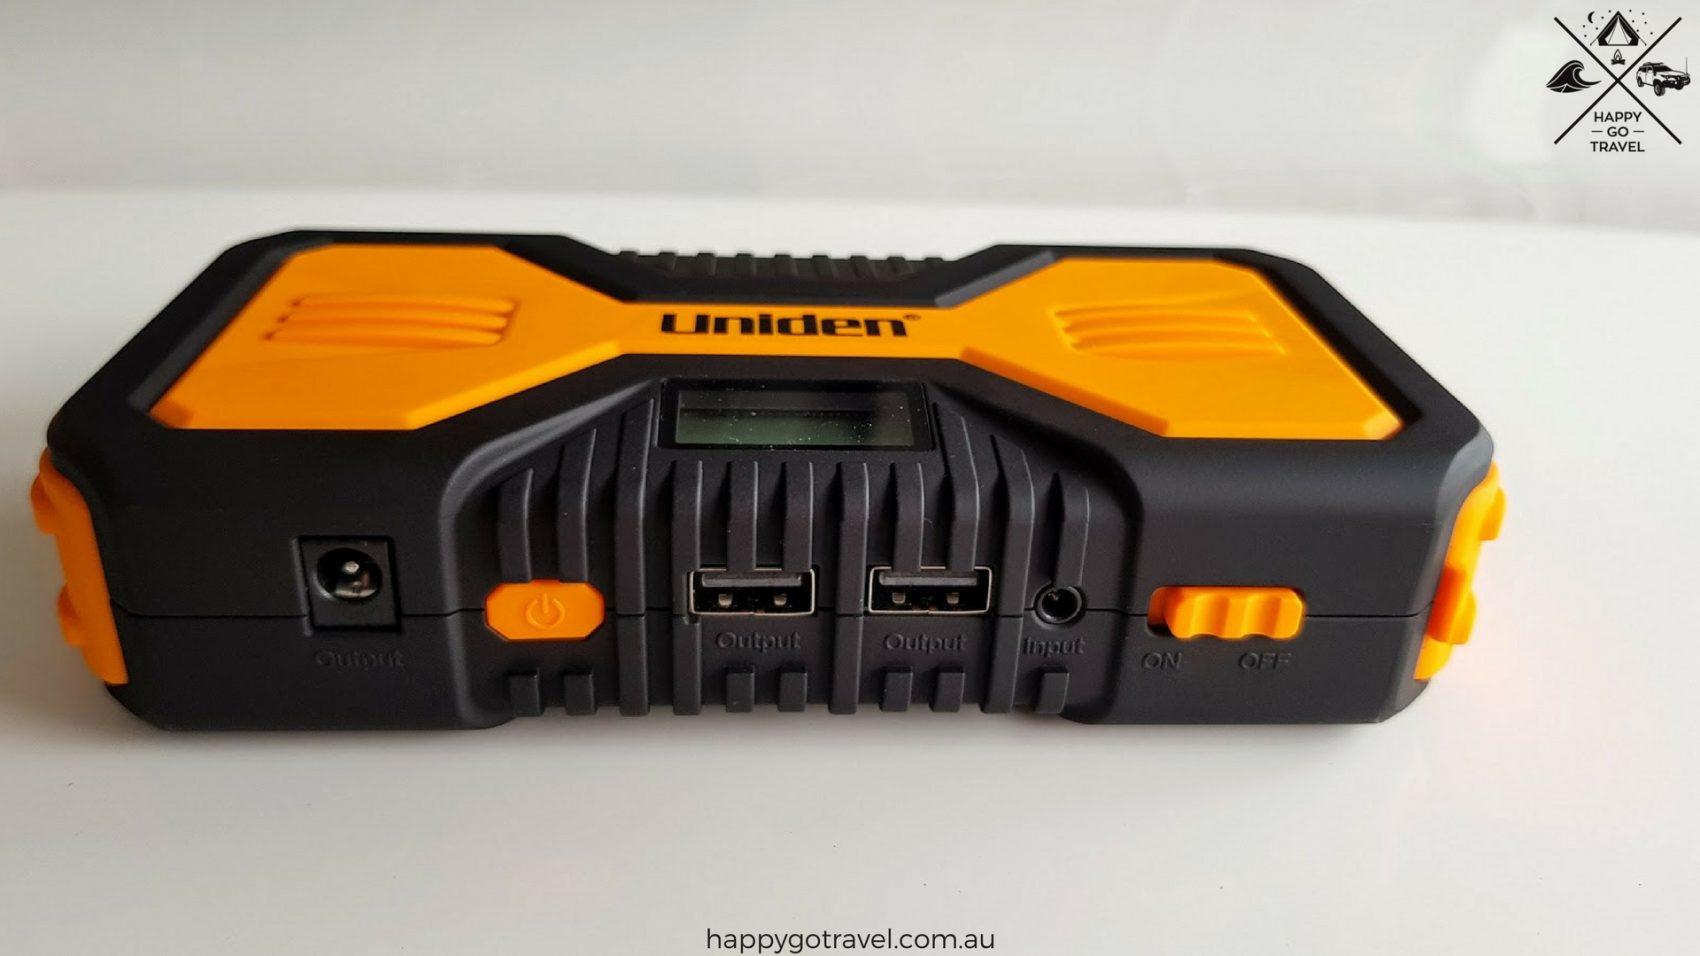 Uniden jump start kit USB ports